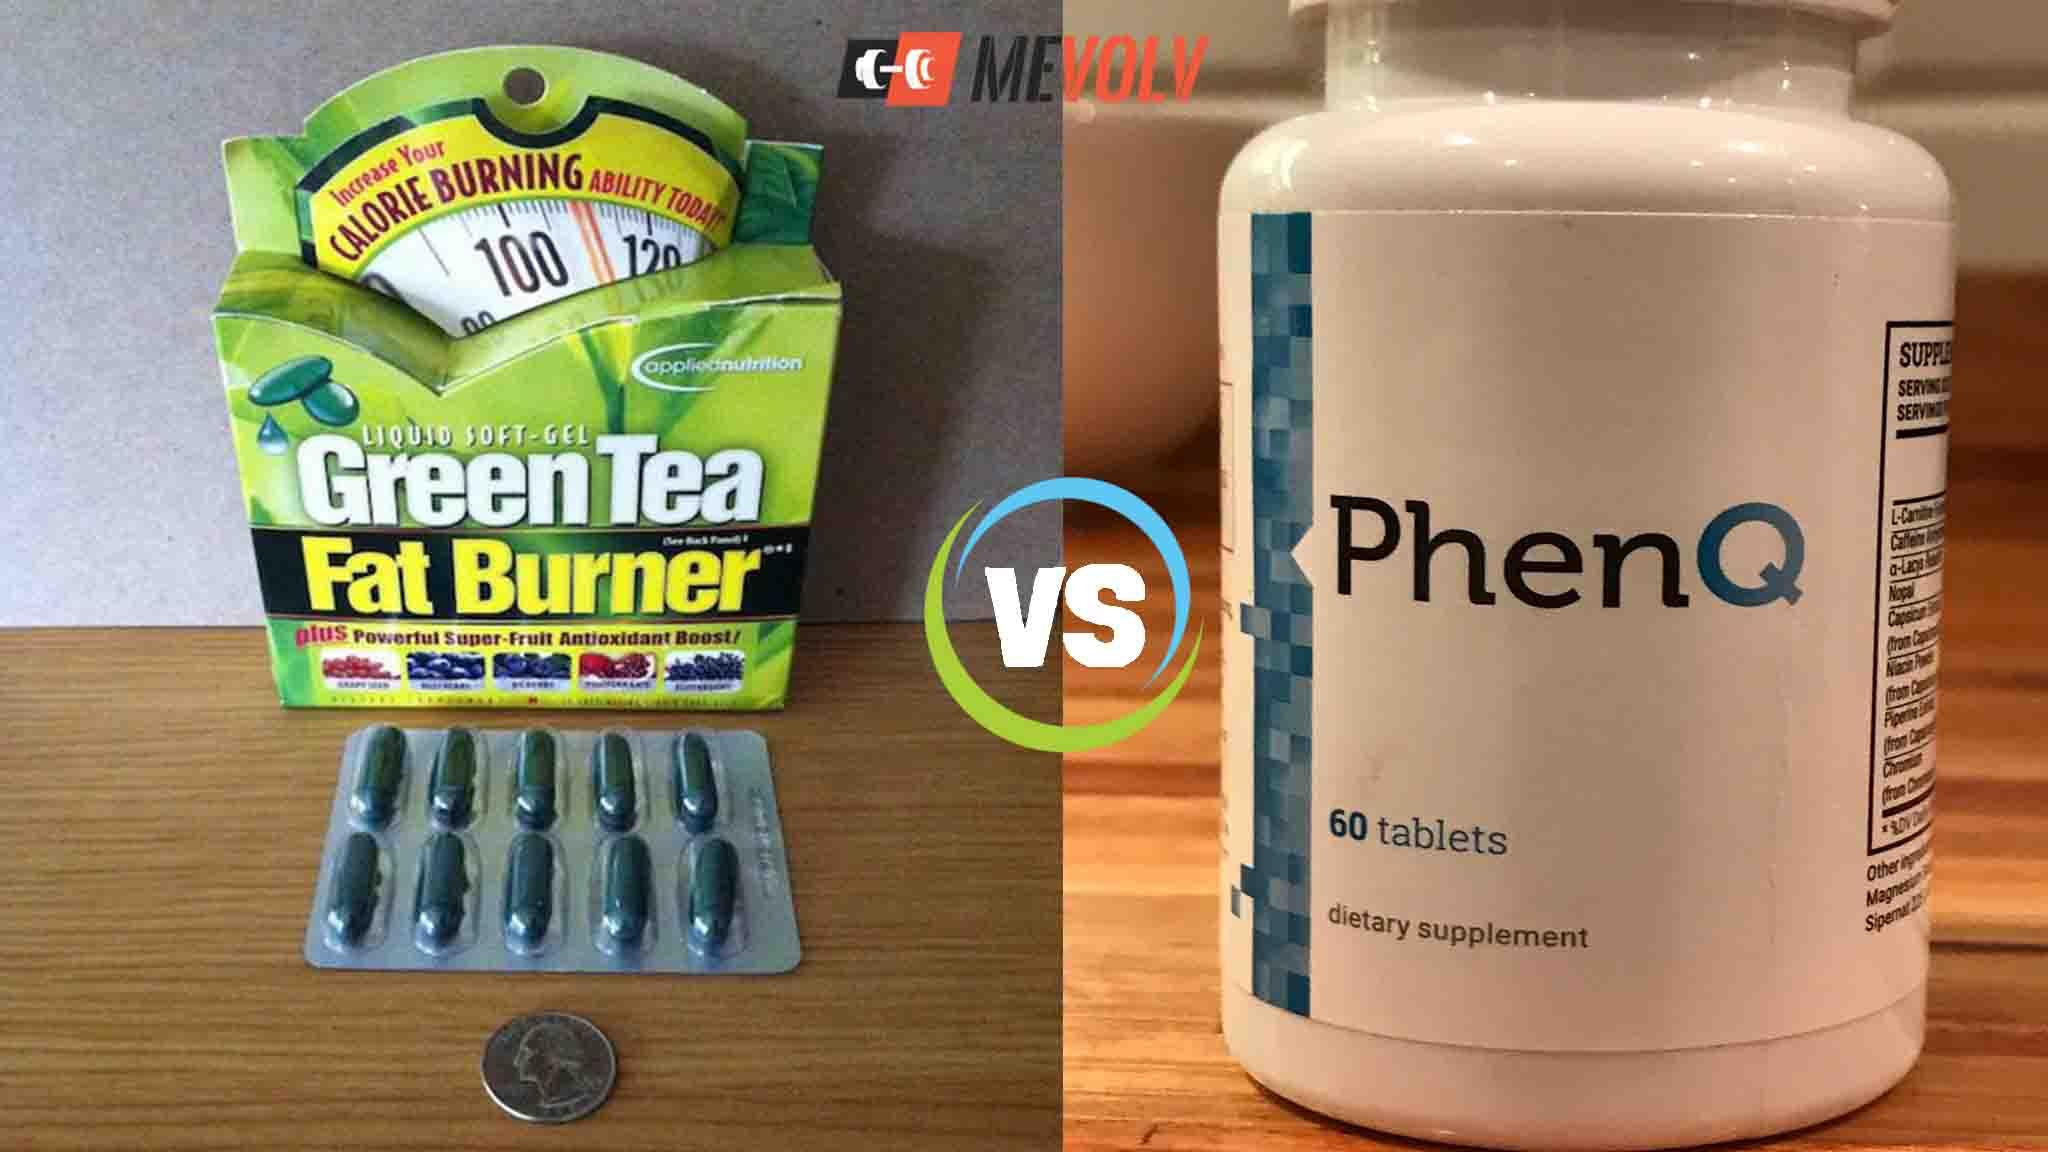 Green tea fat burner full reviews